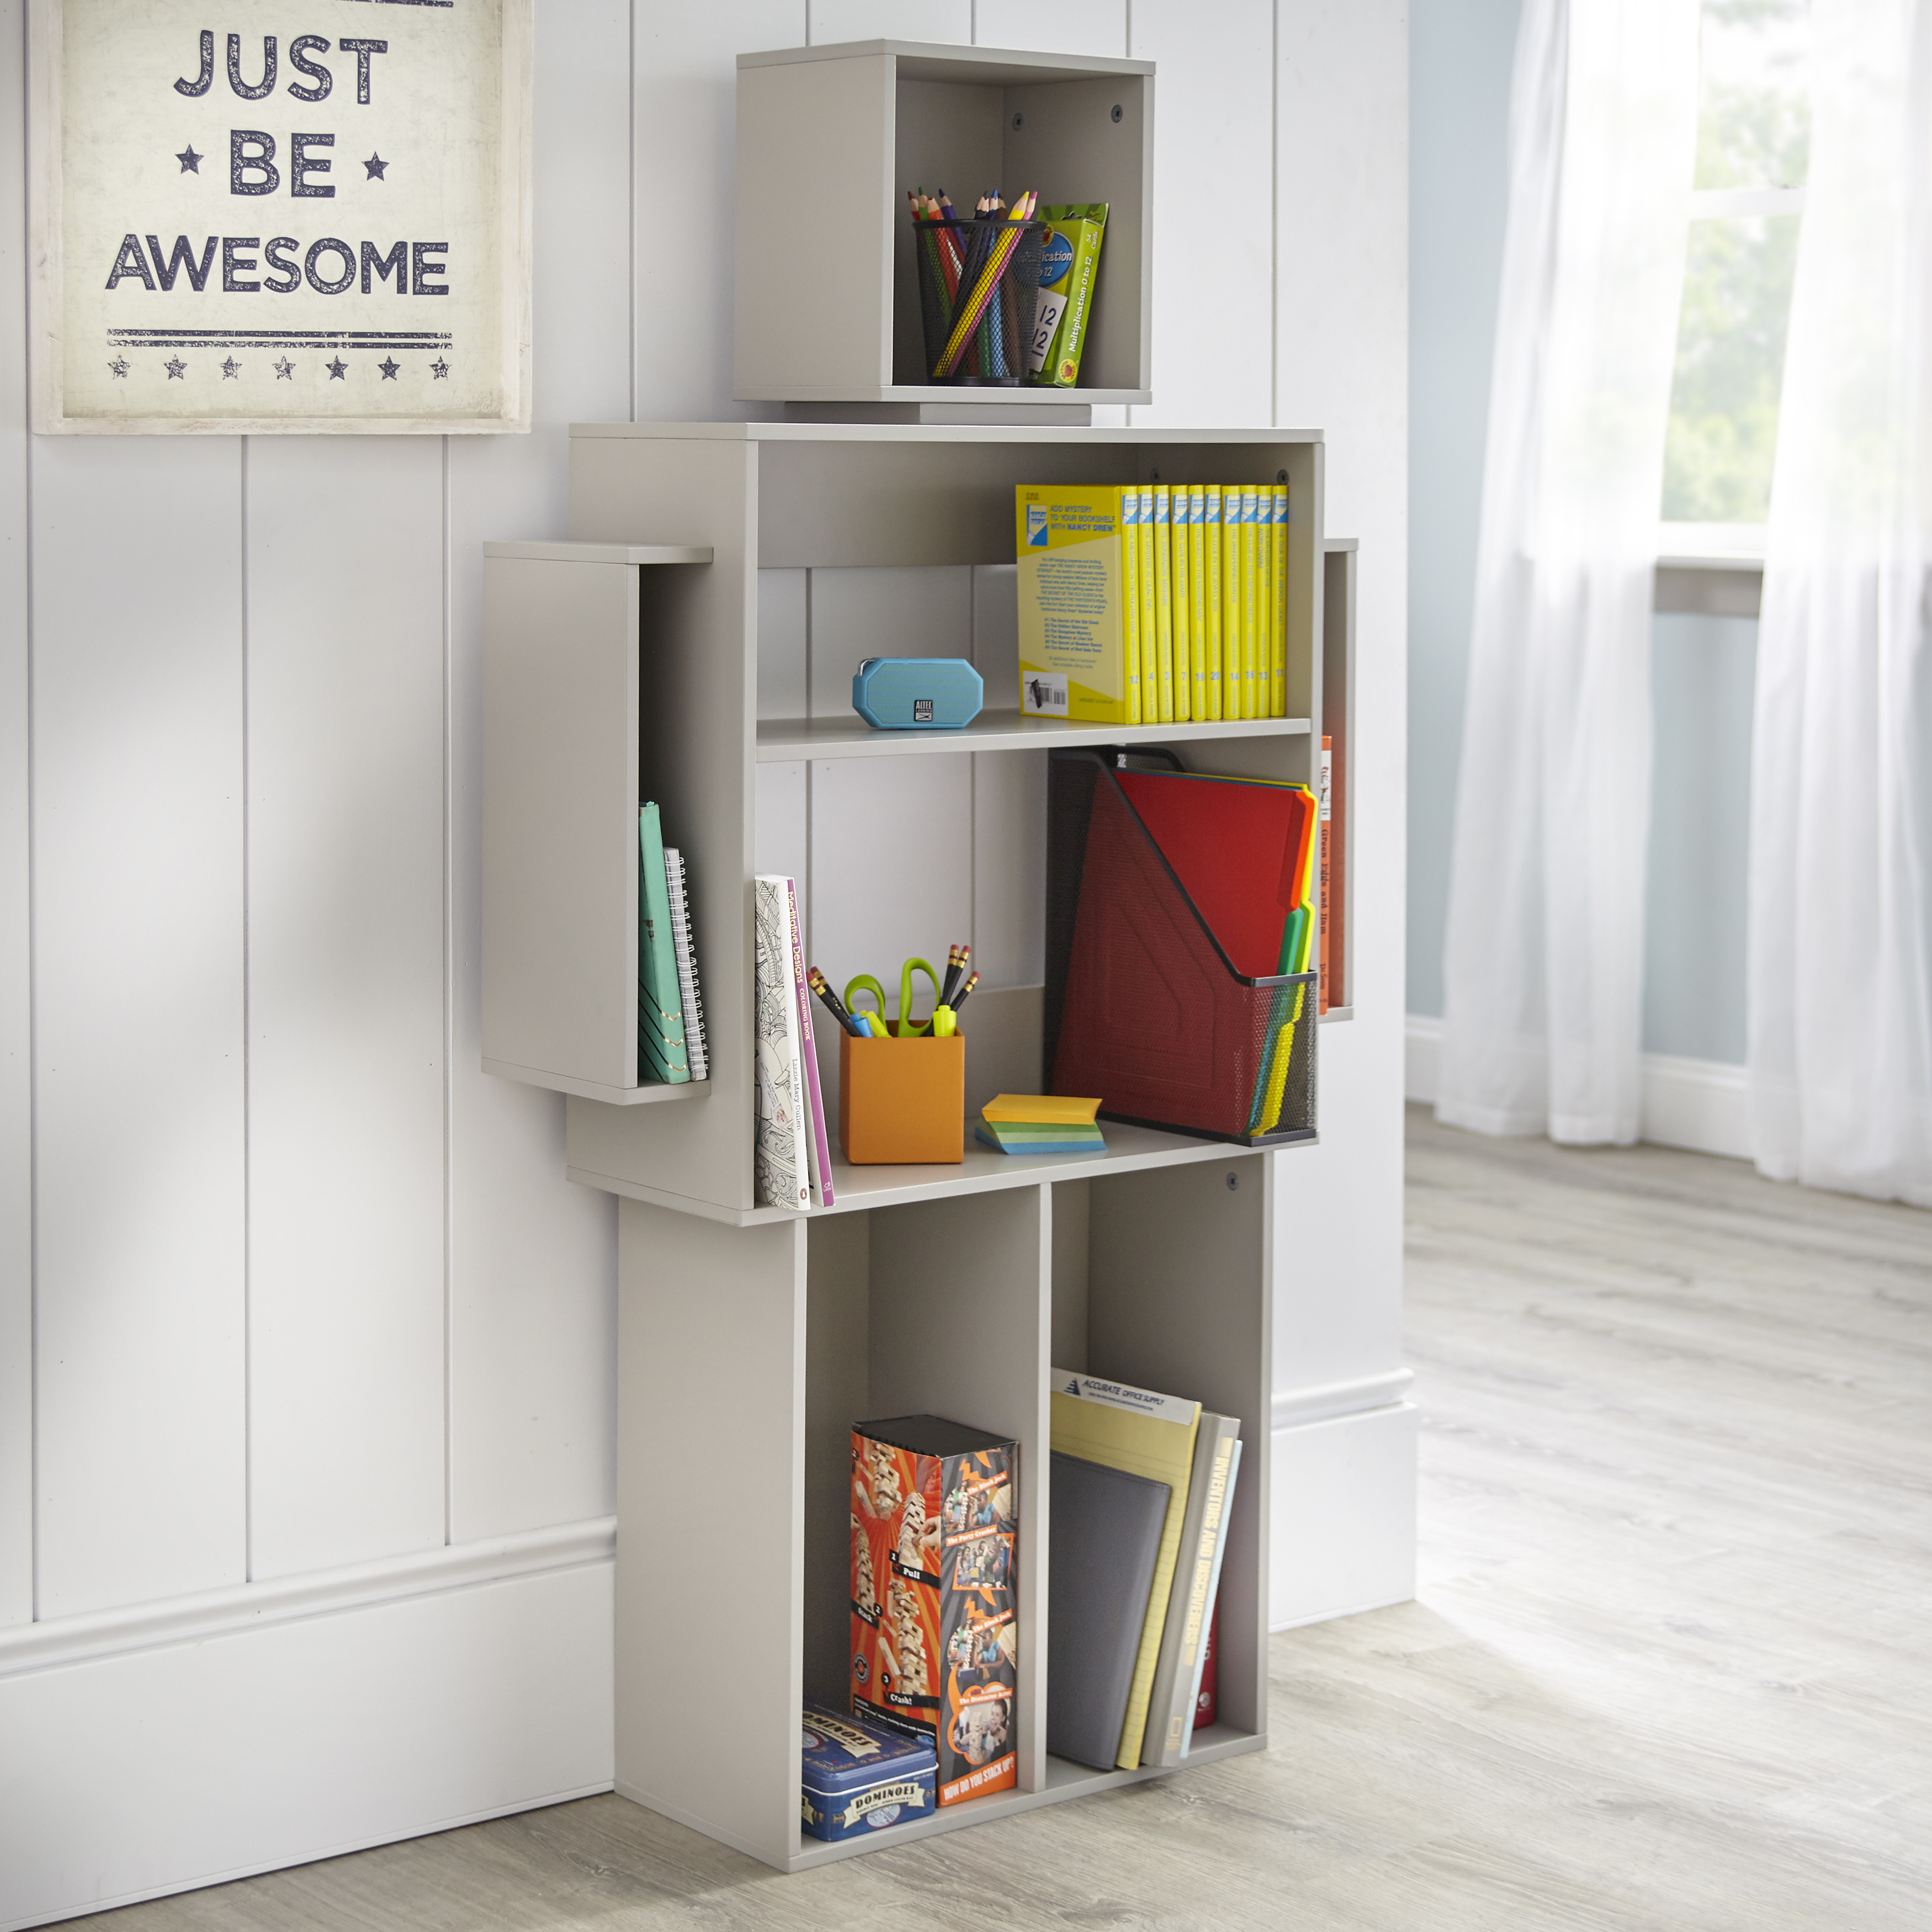 Mainstays Kids Robot Shaped Bookshelf Robot Gray Color Walmart Com